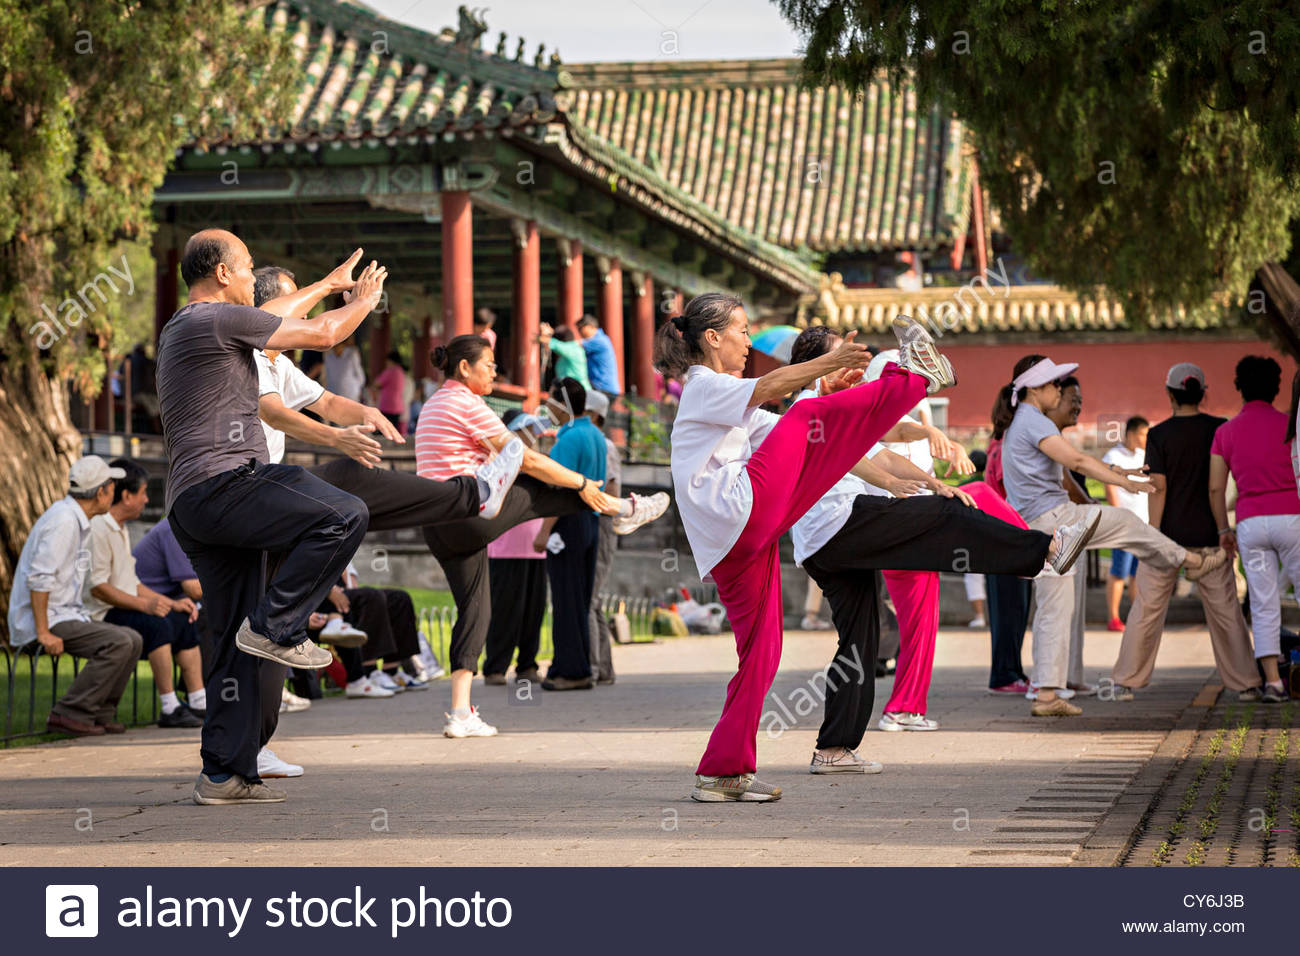 NEXT: MANDATORY TAI CHI CLASSES FOR EVERYONE